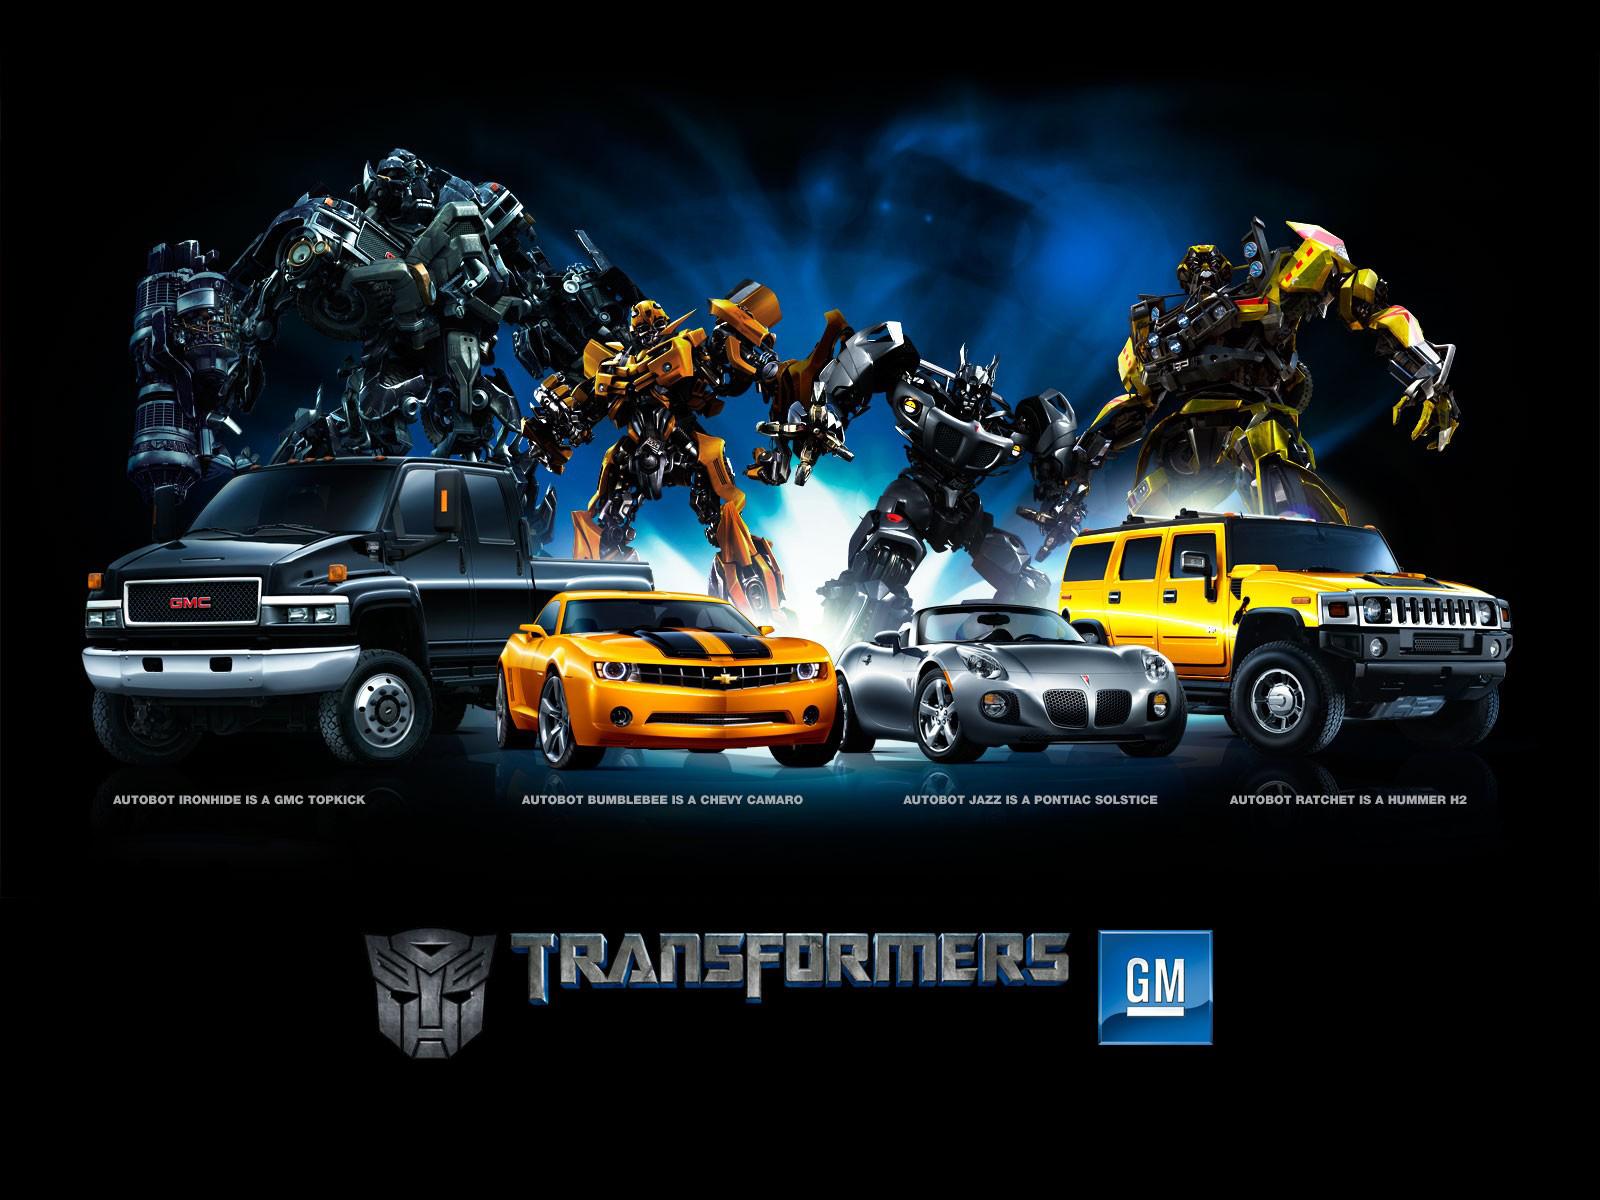 Transformers Movie Wallpaper computer desktop wallpapers 1600x1200